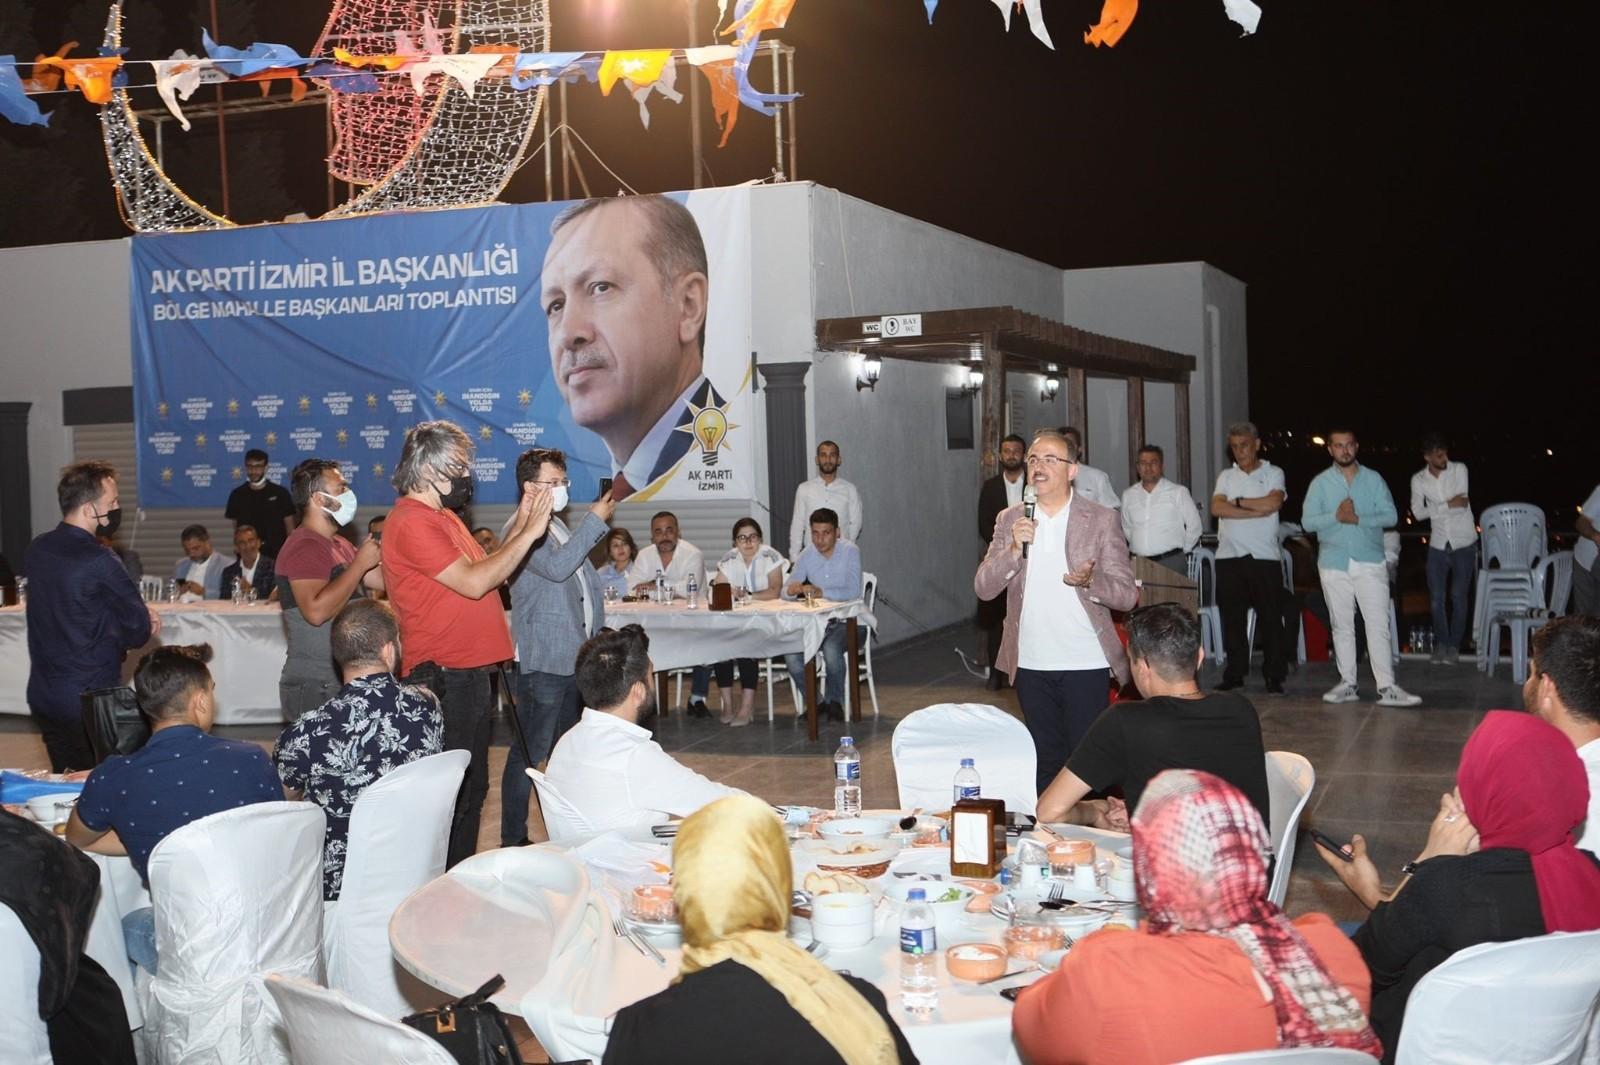 Başkan Sürekli'den yoğun Aliağa mesaisi